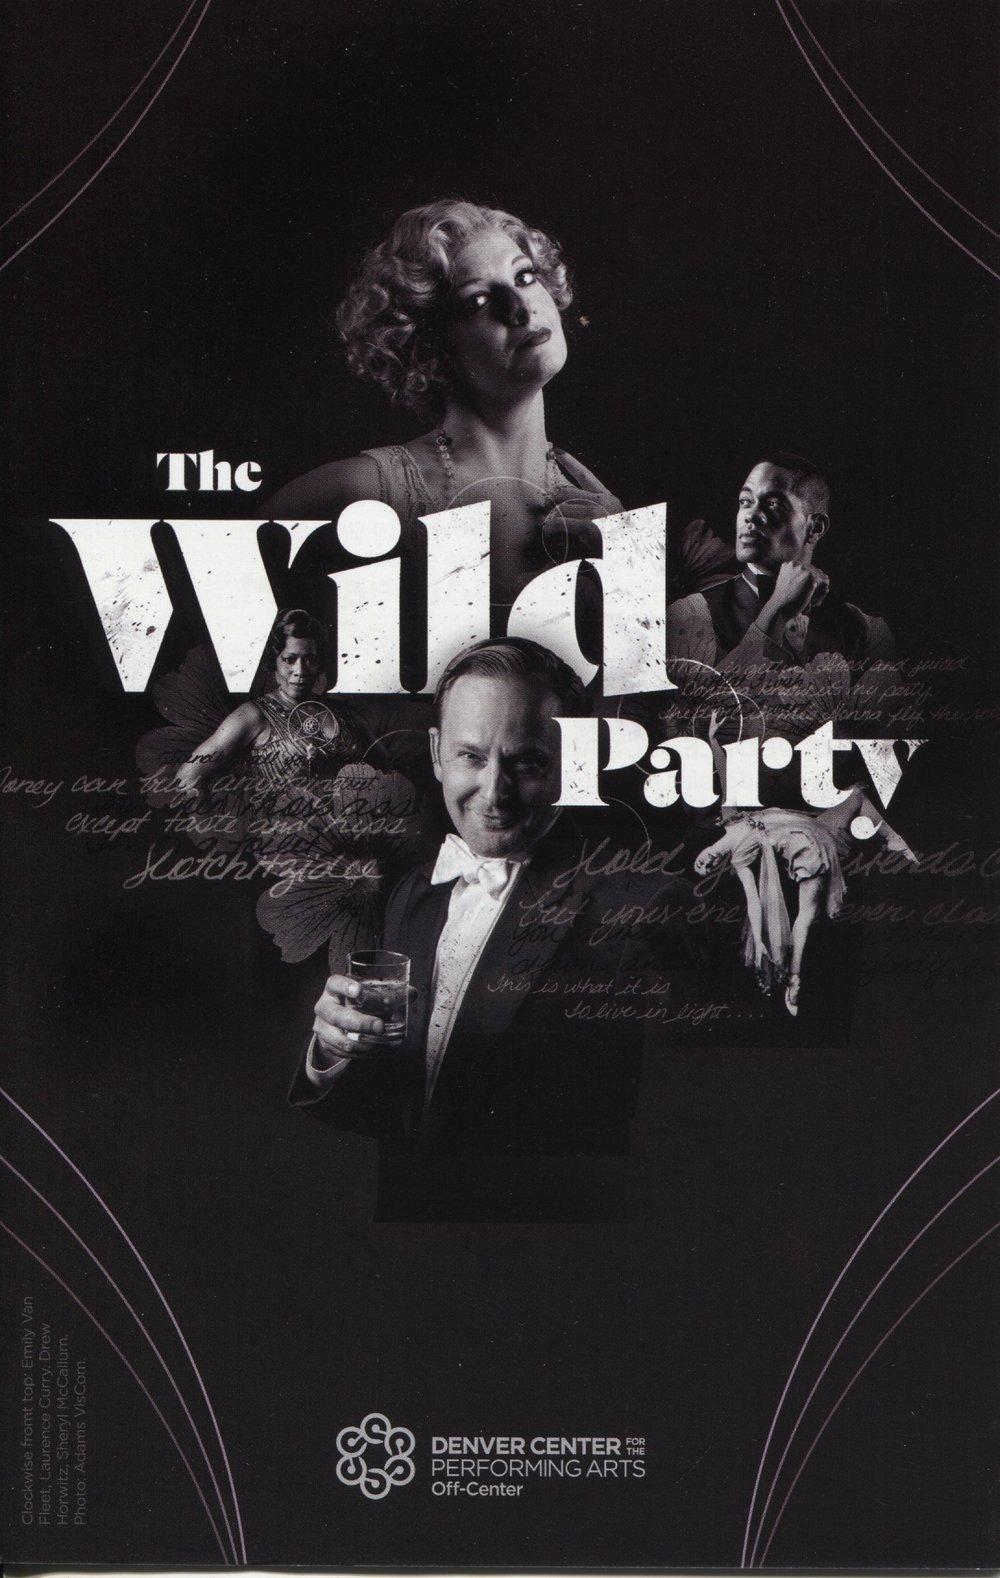 Denver Center Off-Center's  The Wild Party